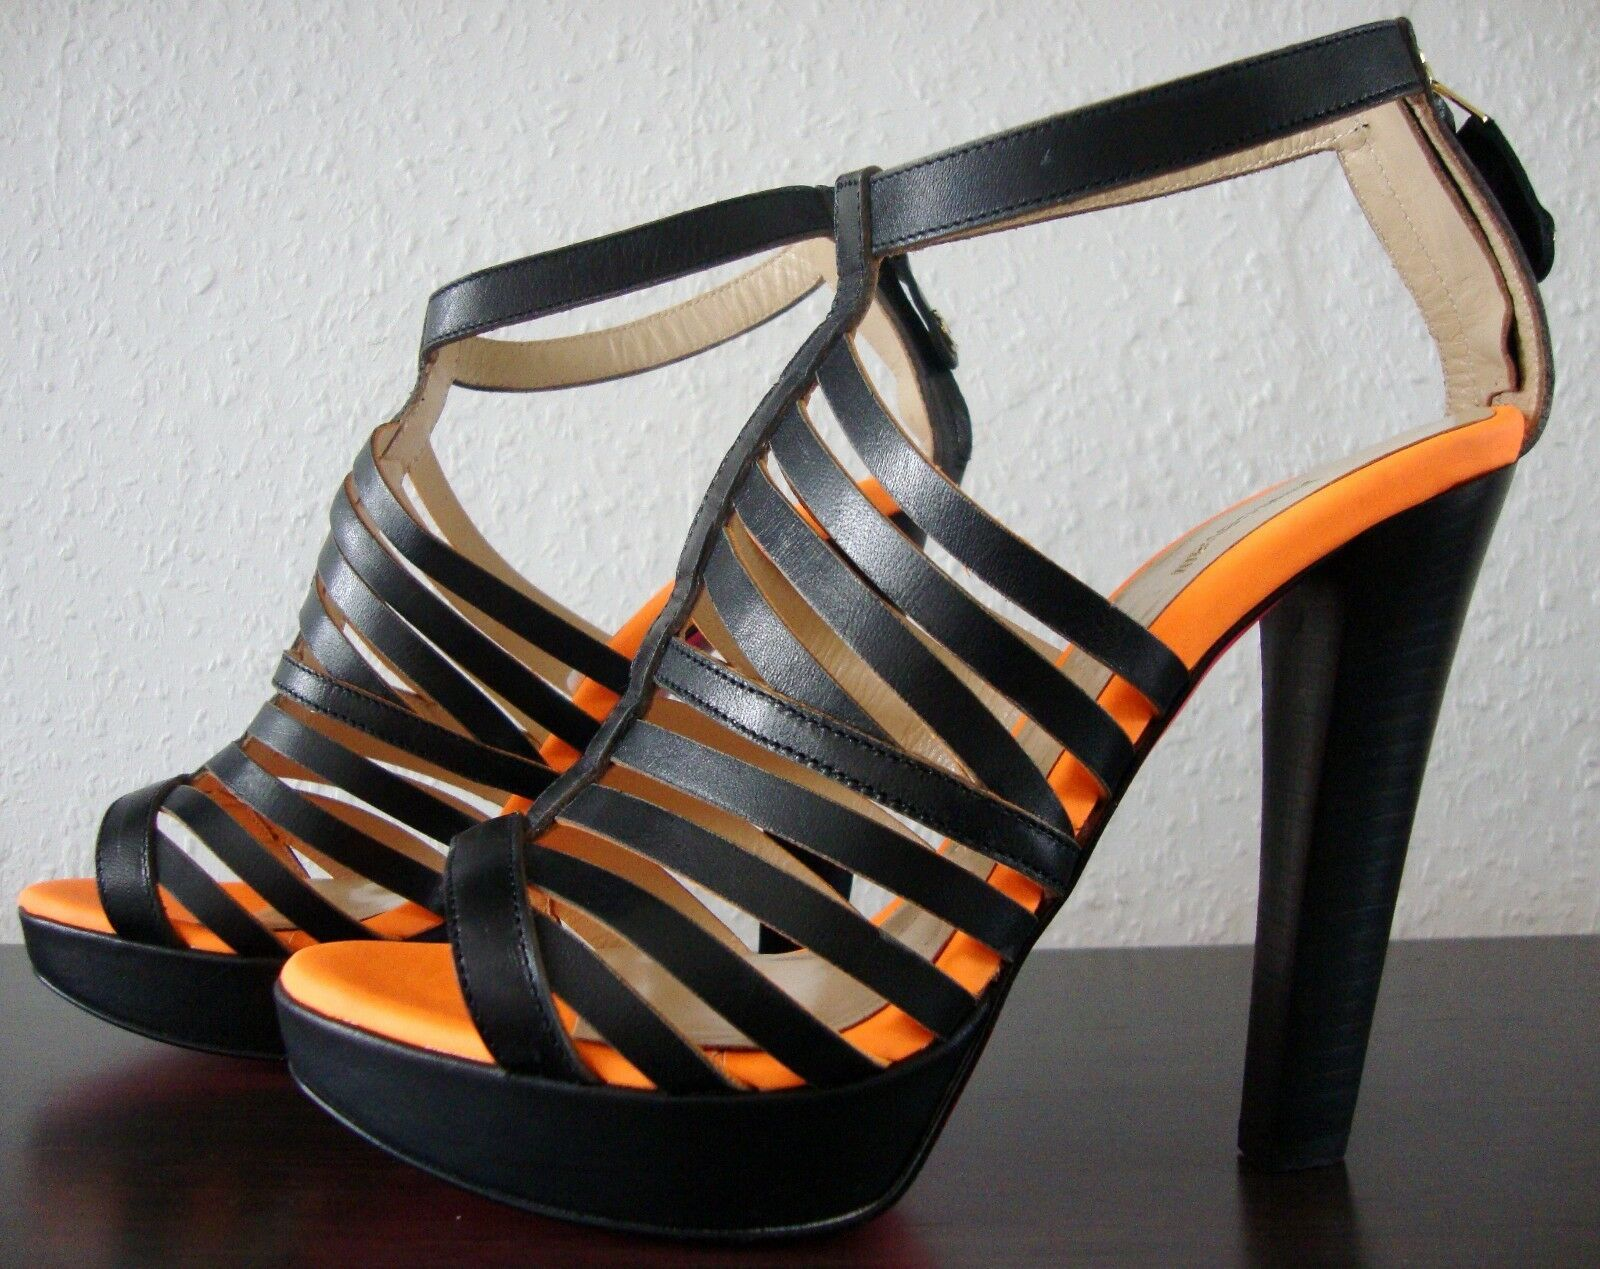 JUST CAVALLI Schuhe Damen Leather Sandals Leder Sandaletten Sandalen Gr.37 NEU